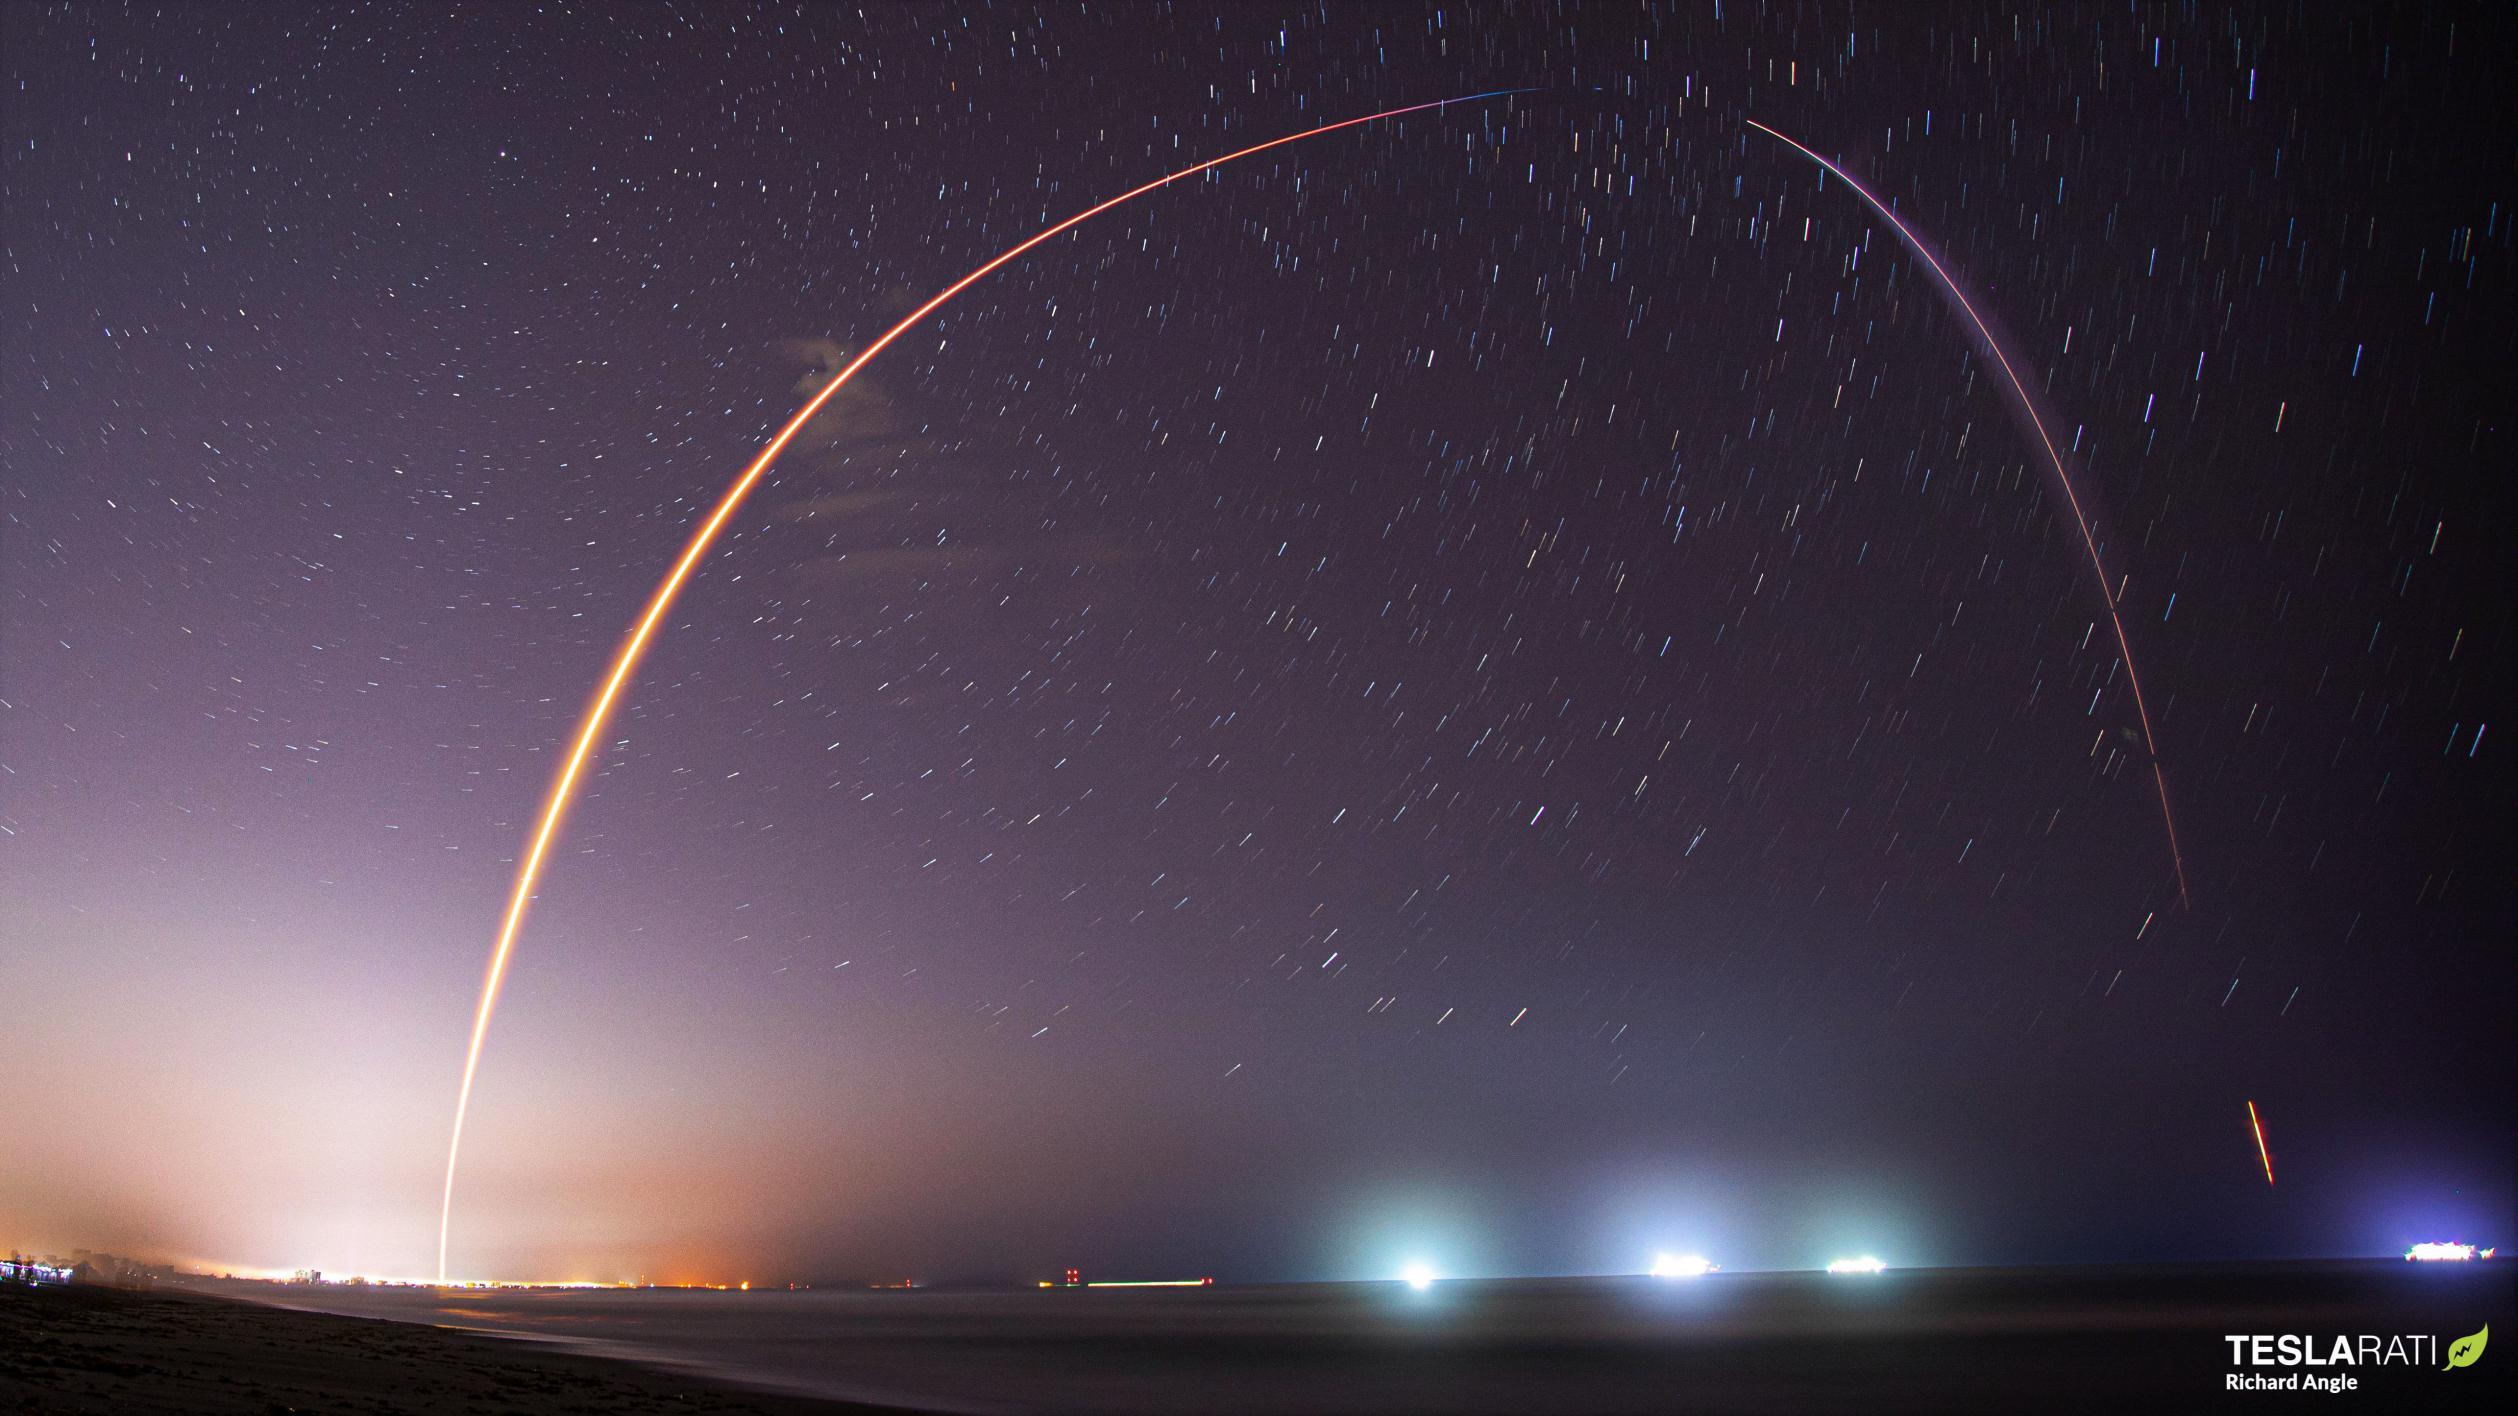 Starlink-21 Falcon 9 B1051 LC-39A 031421 (Richard Angle) streak 1 (c)